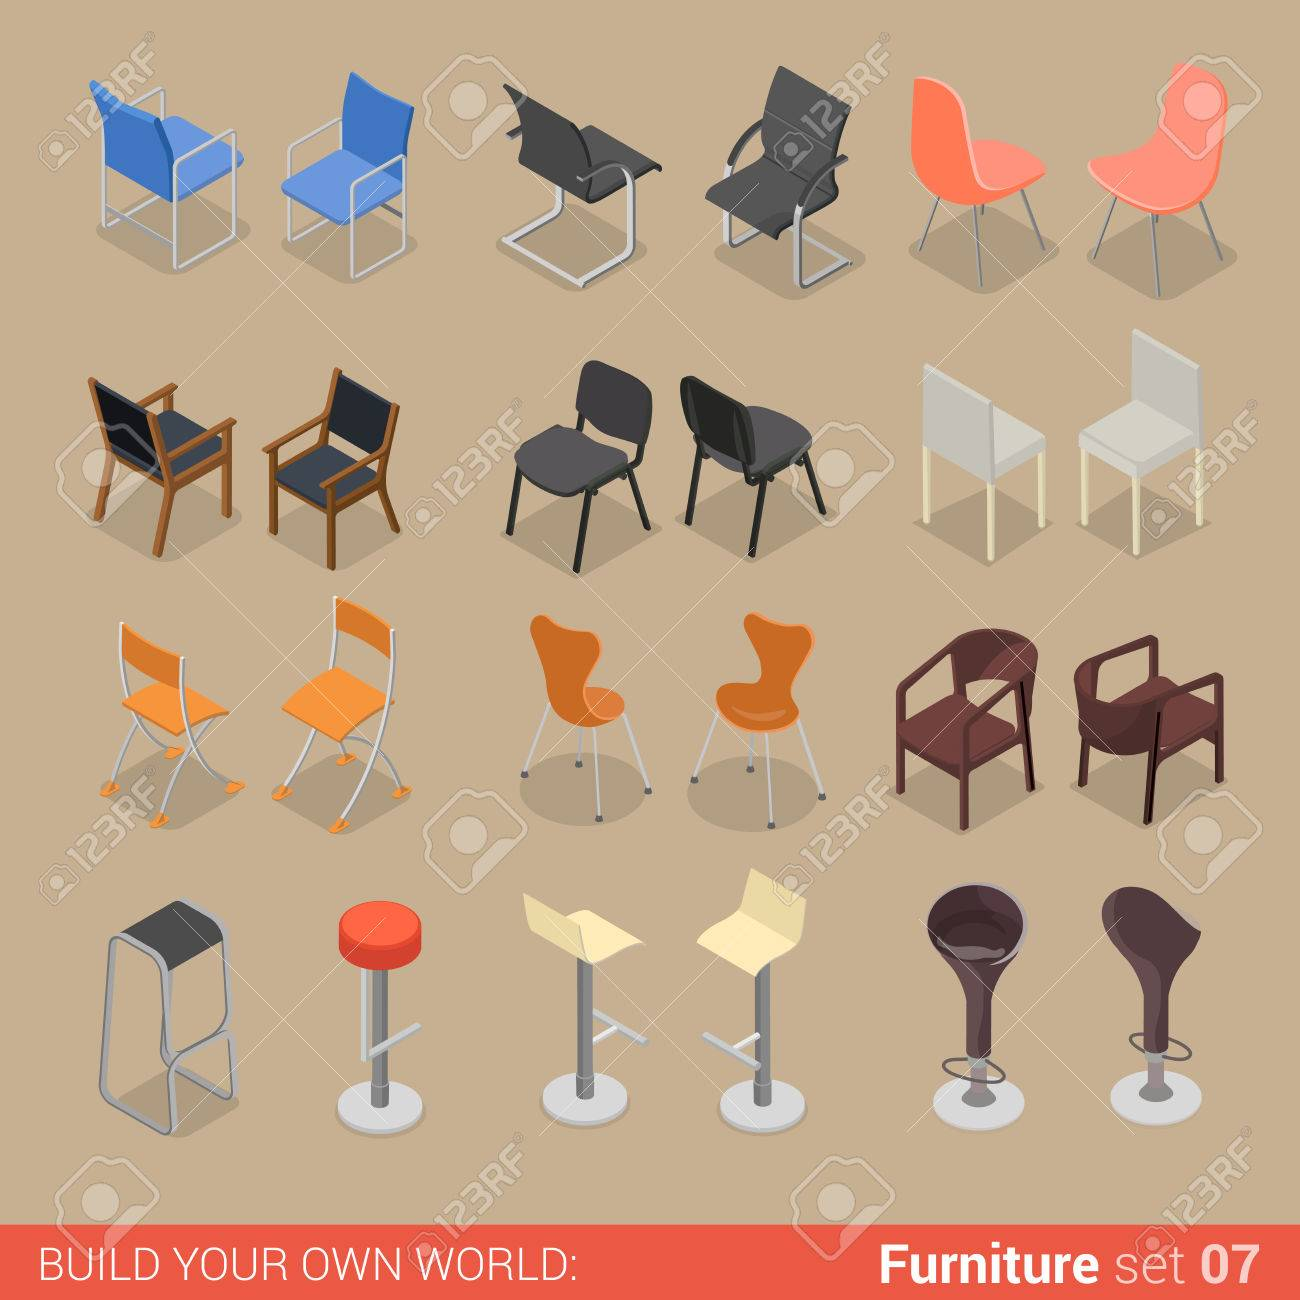 Office Home Bar Restaurant Furniture Set 07 Chair Seat Armchair